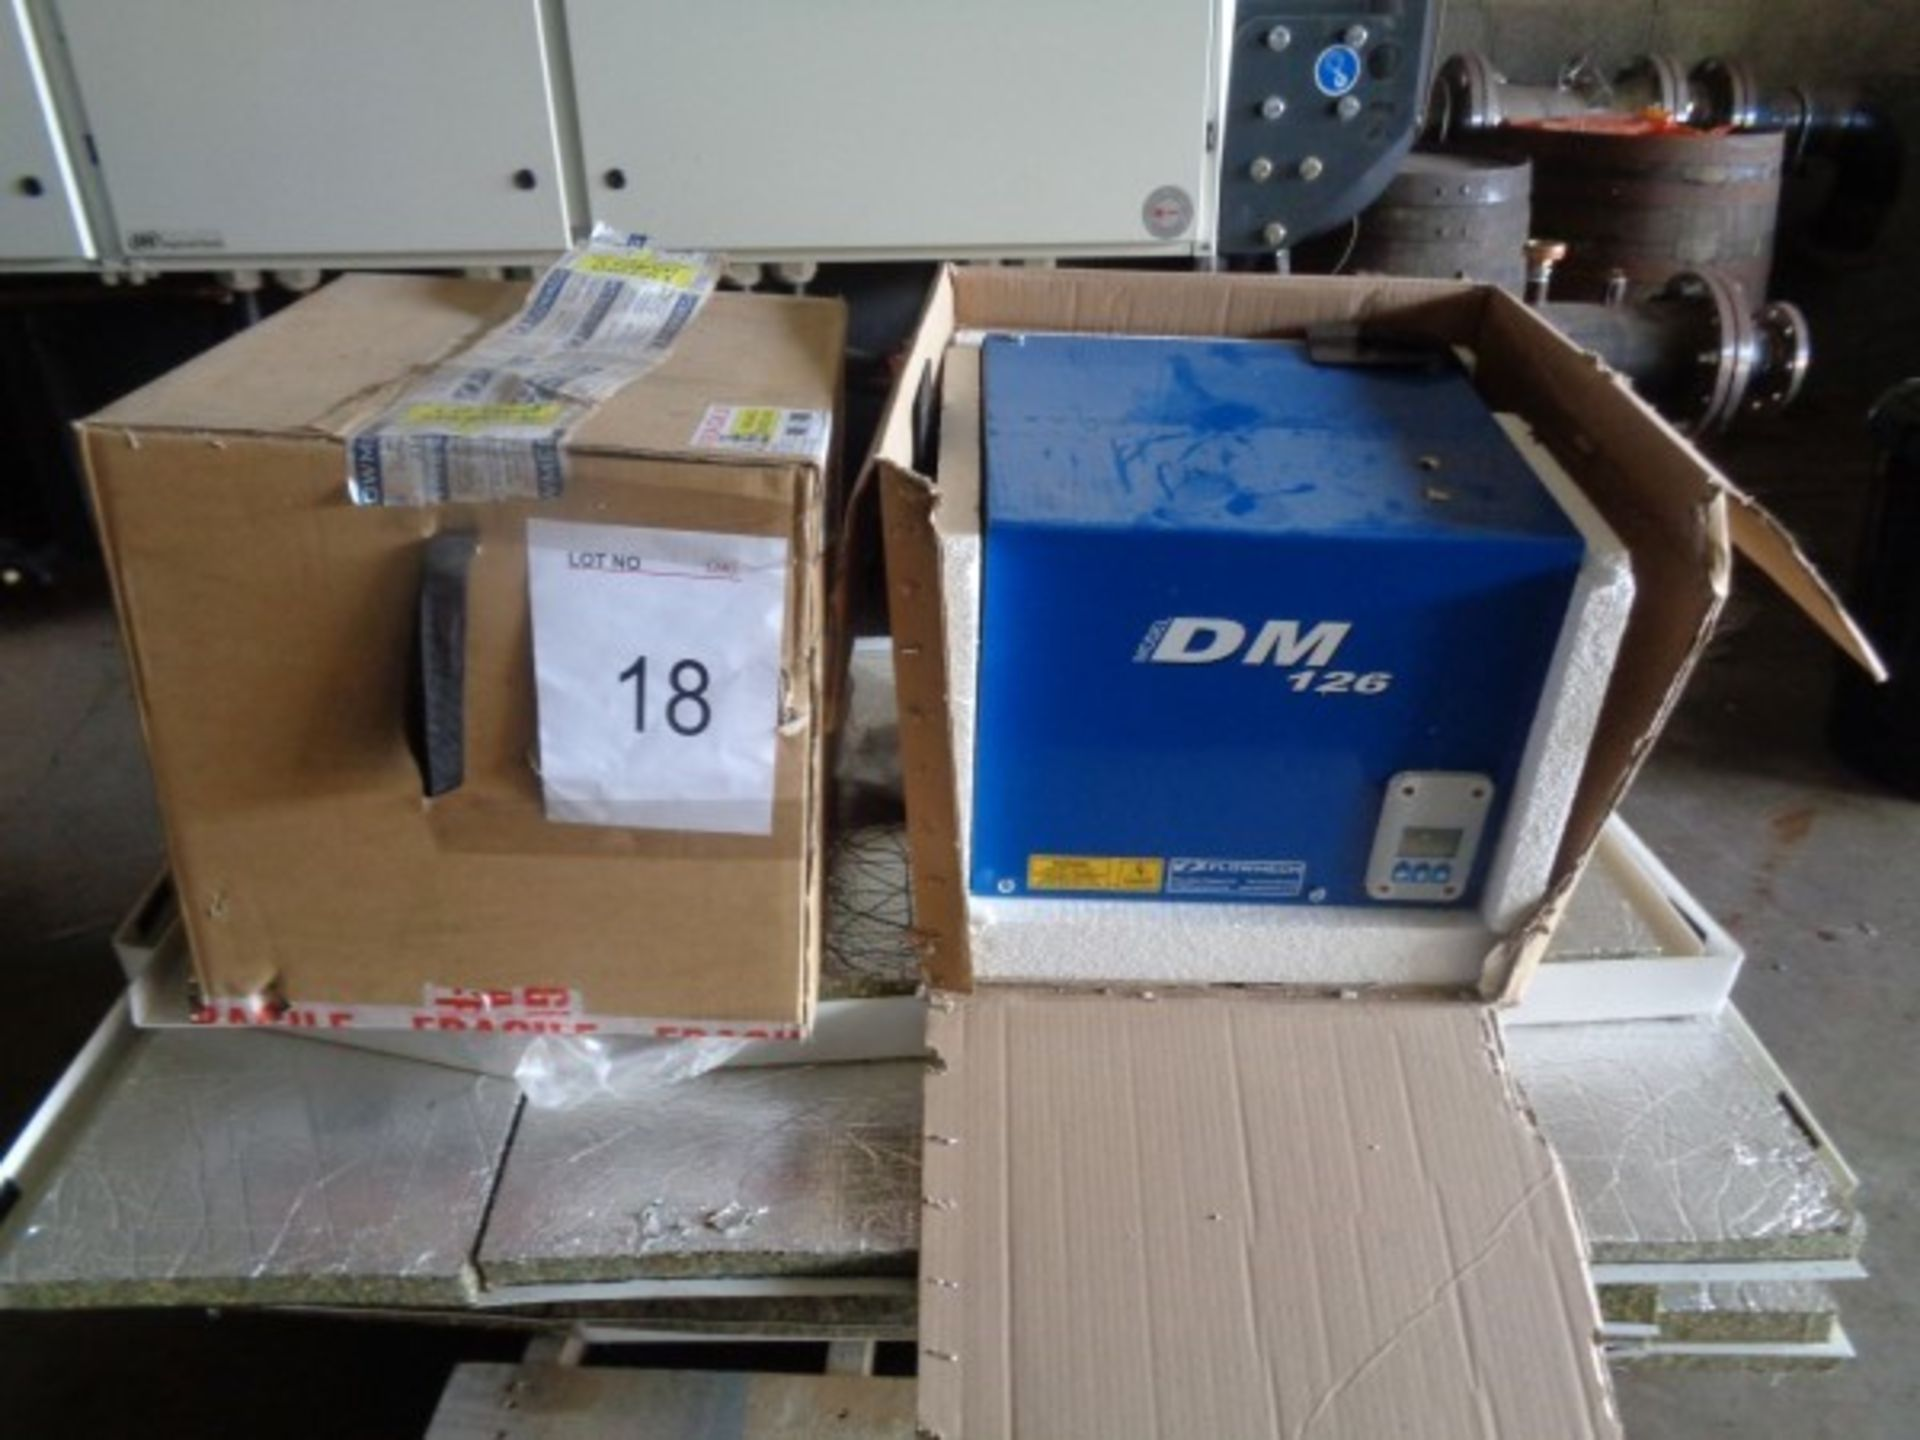 2 x Flowmeter model DM126 Pump sets